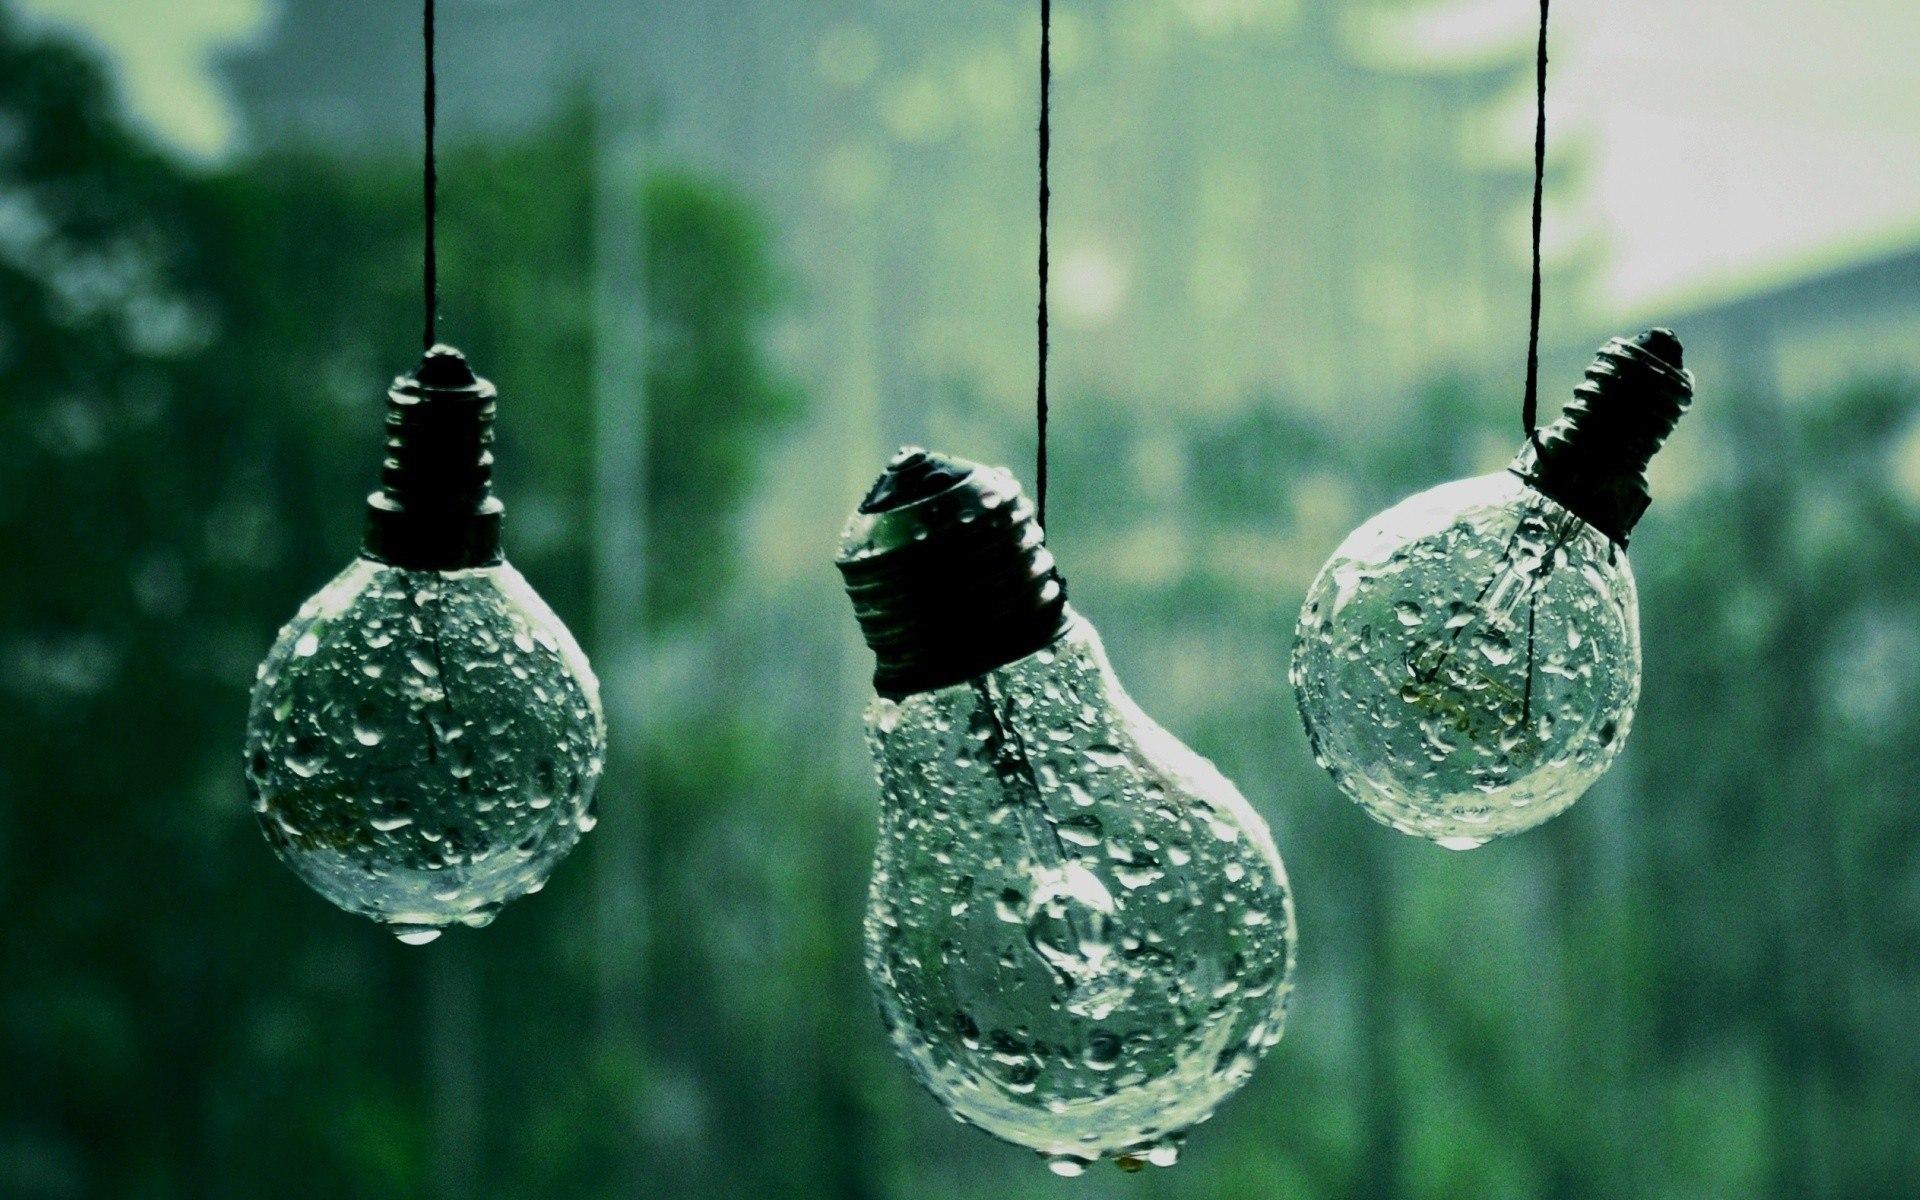 15 советов при съемке в плохую погоду